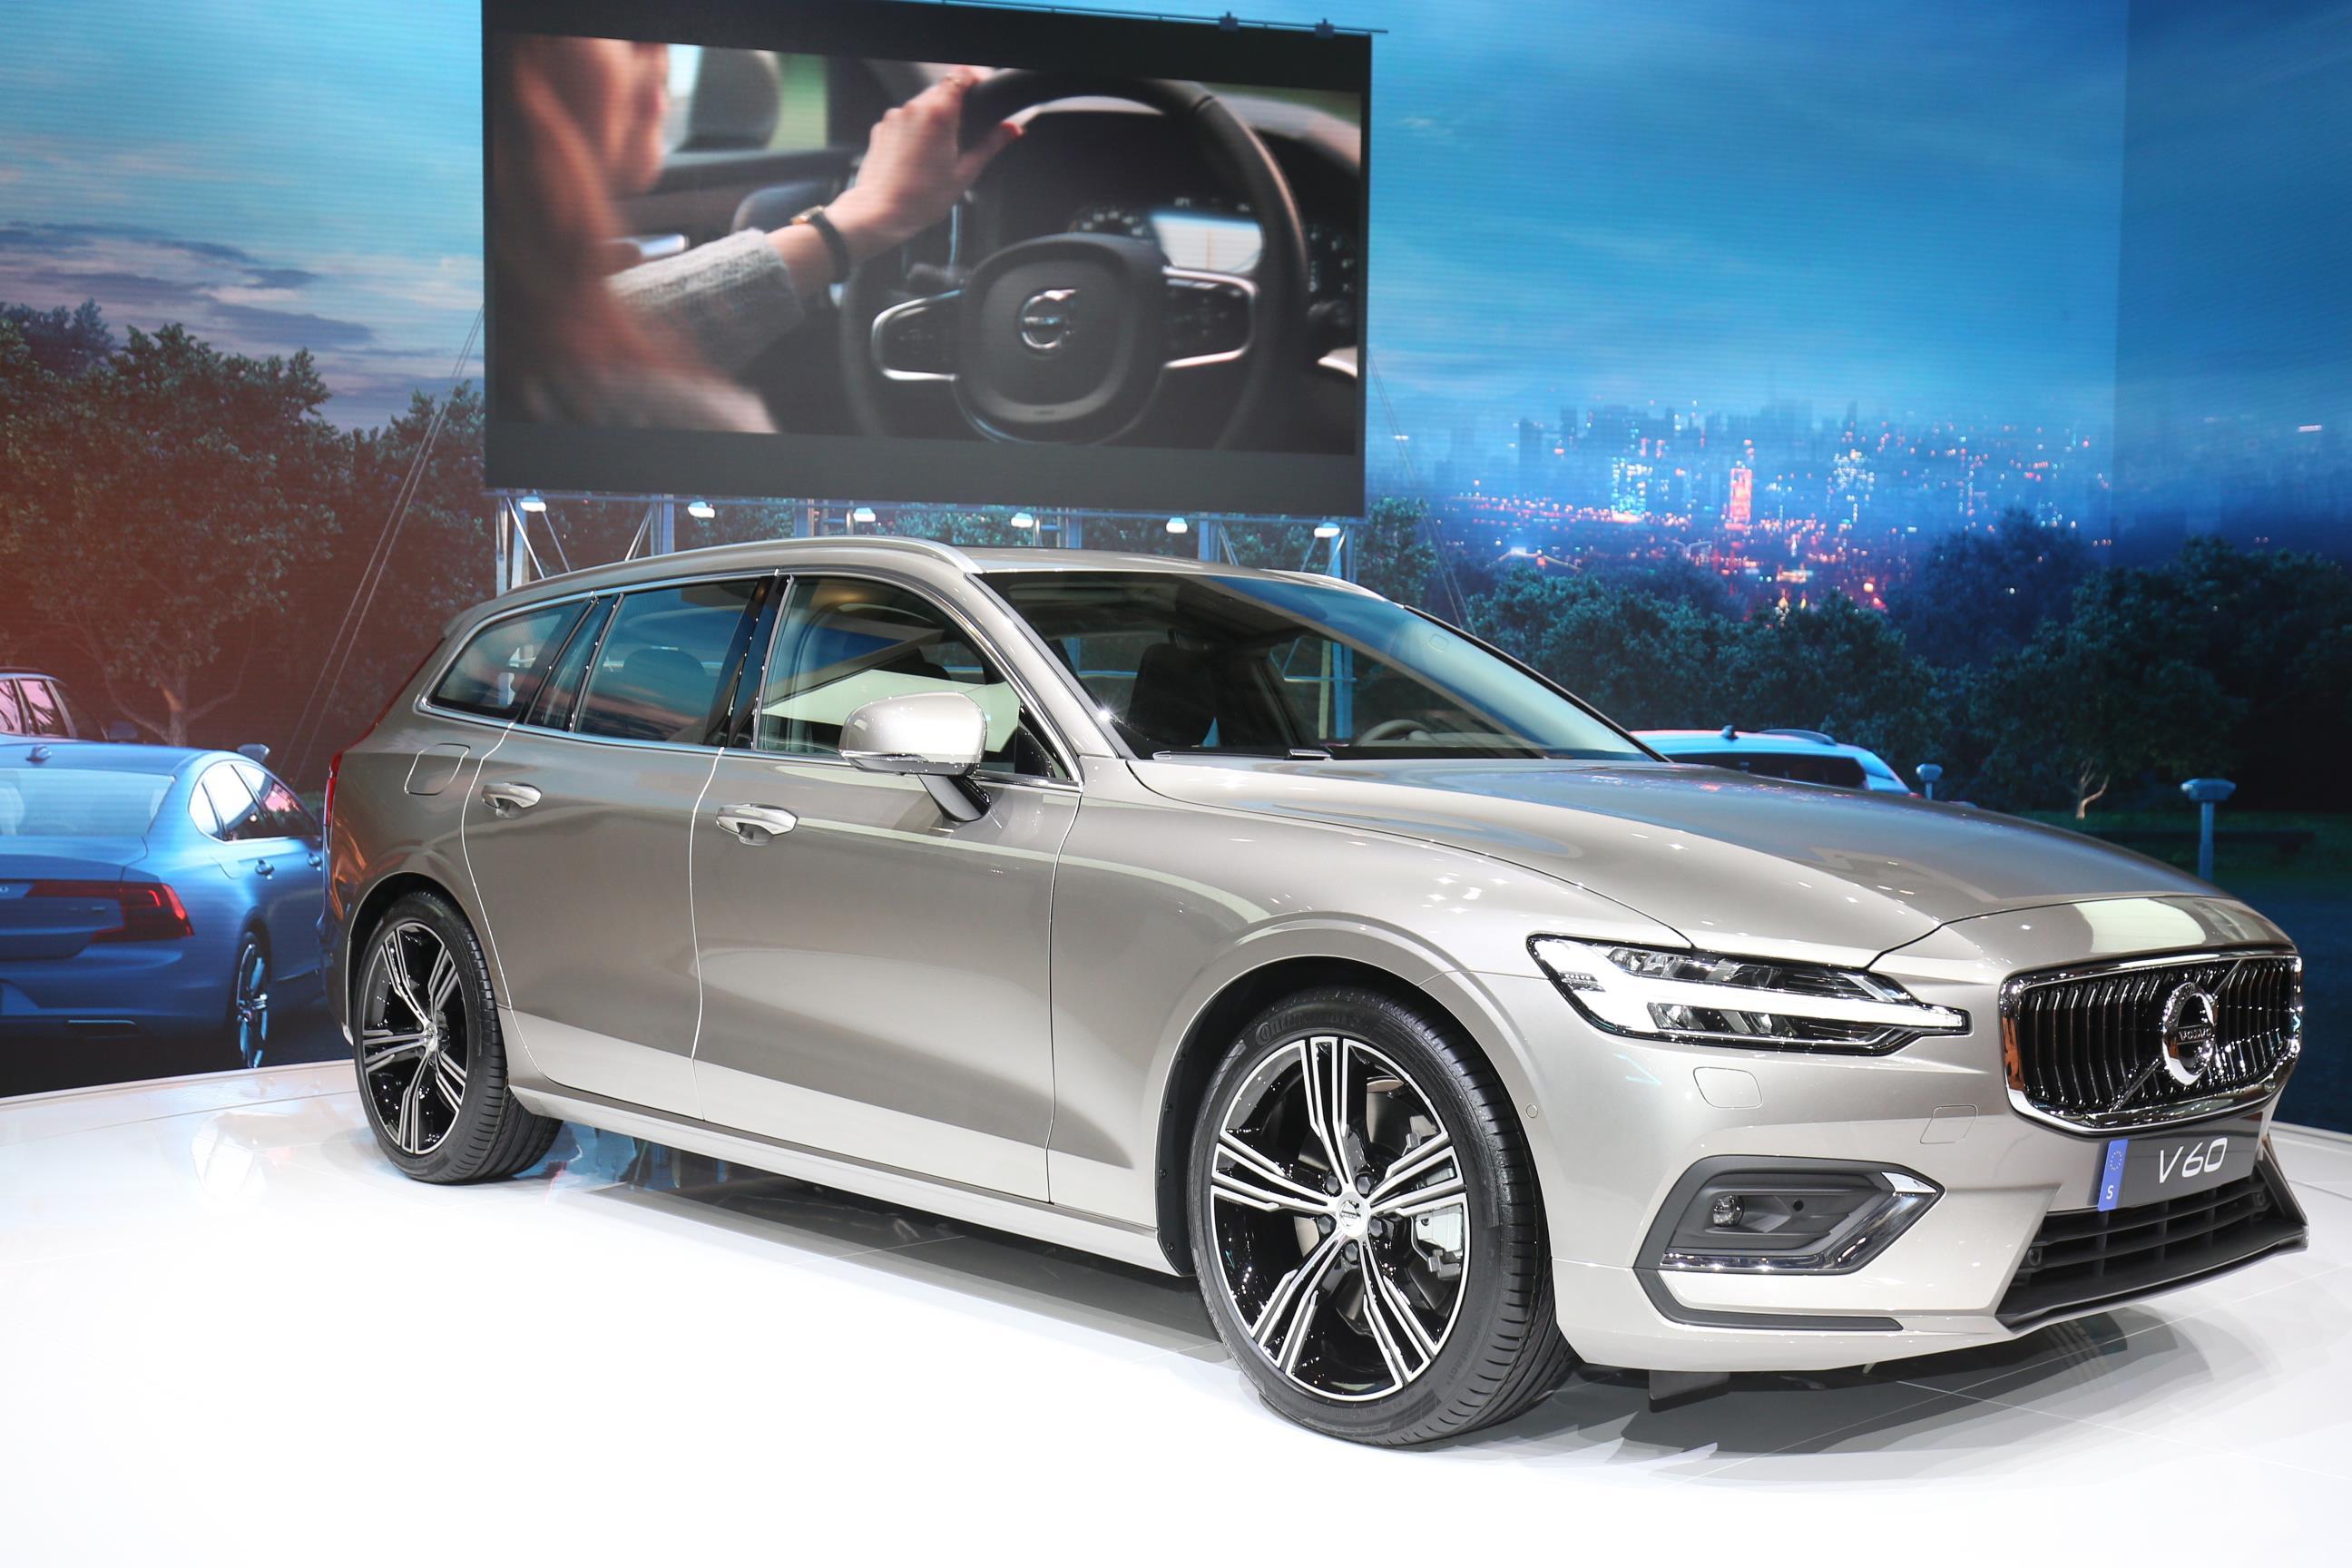 Geneva Motor Show 2018 Mega Gallery Part 2 (314)